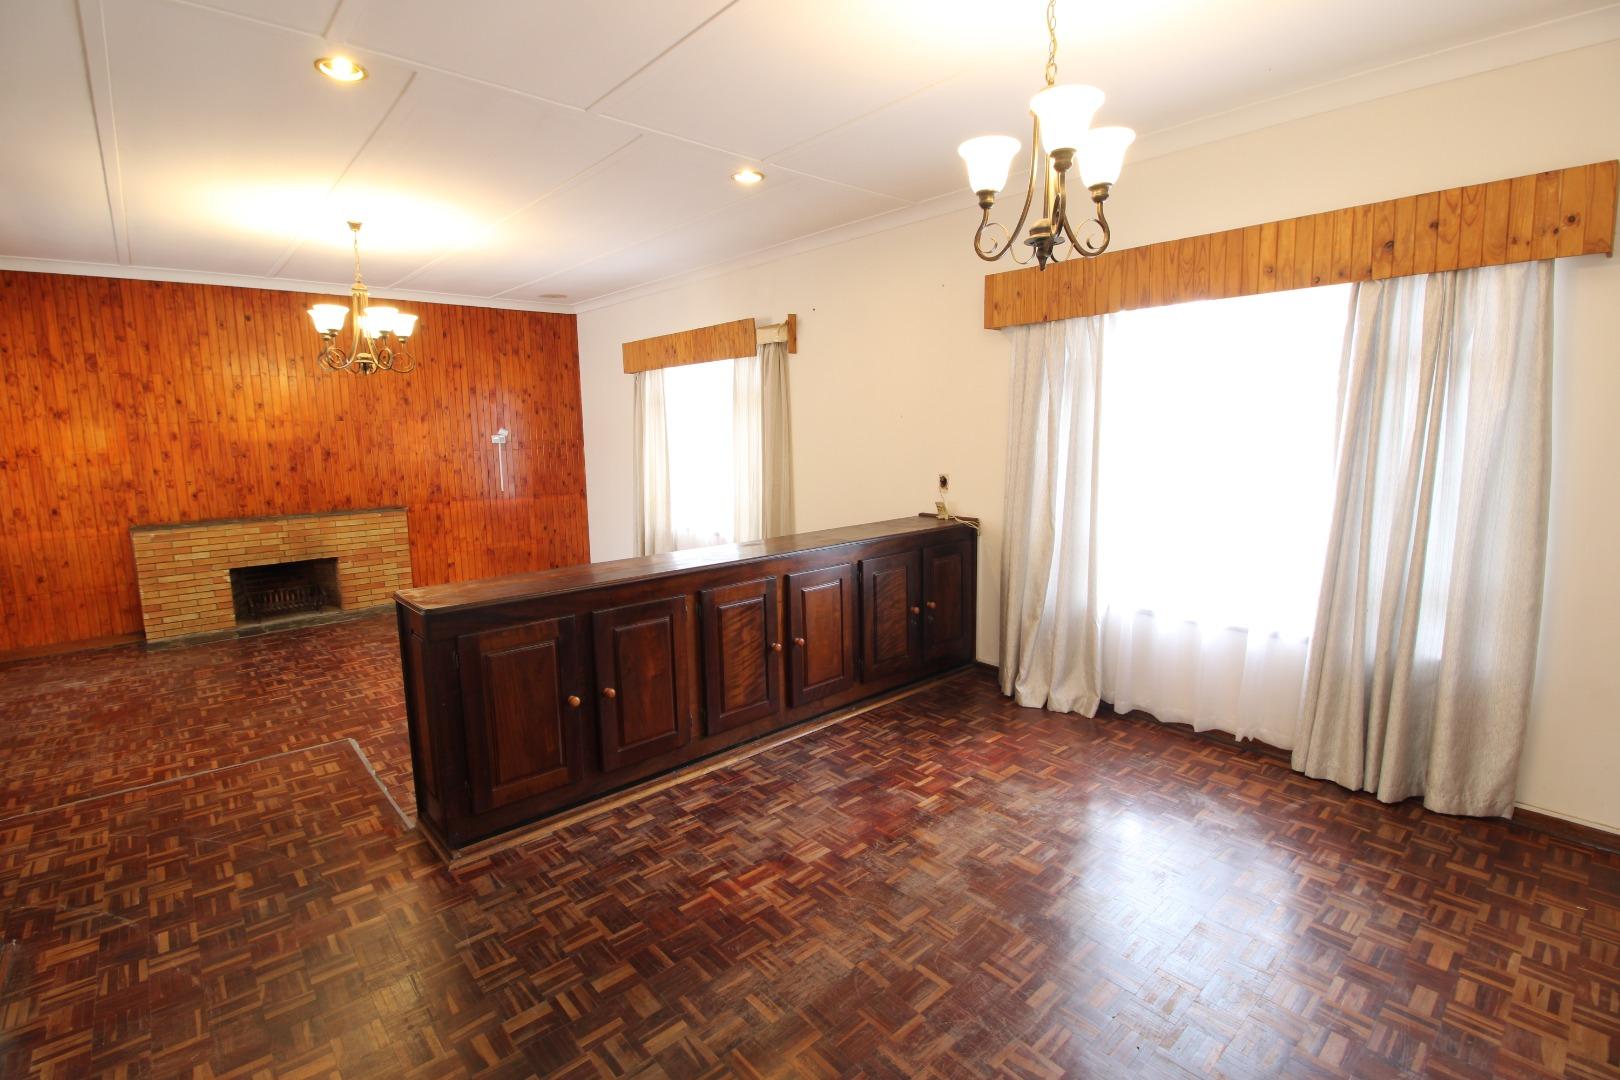 4 Bedroom House For Sale in Potchefstroom Central